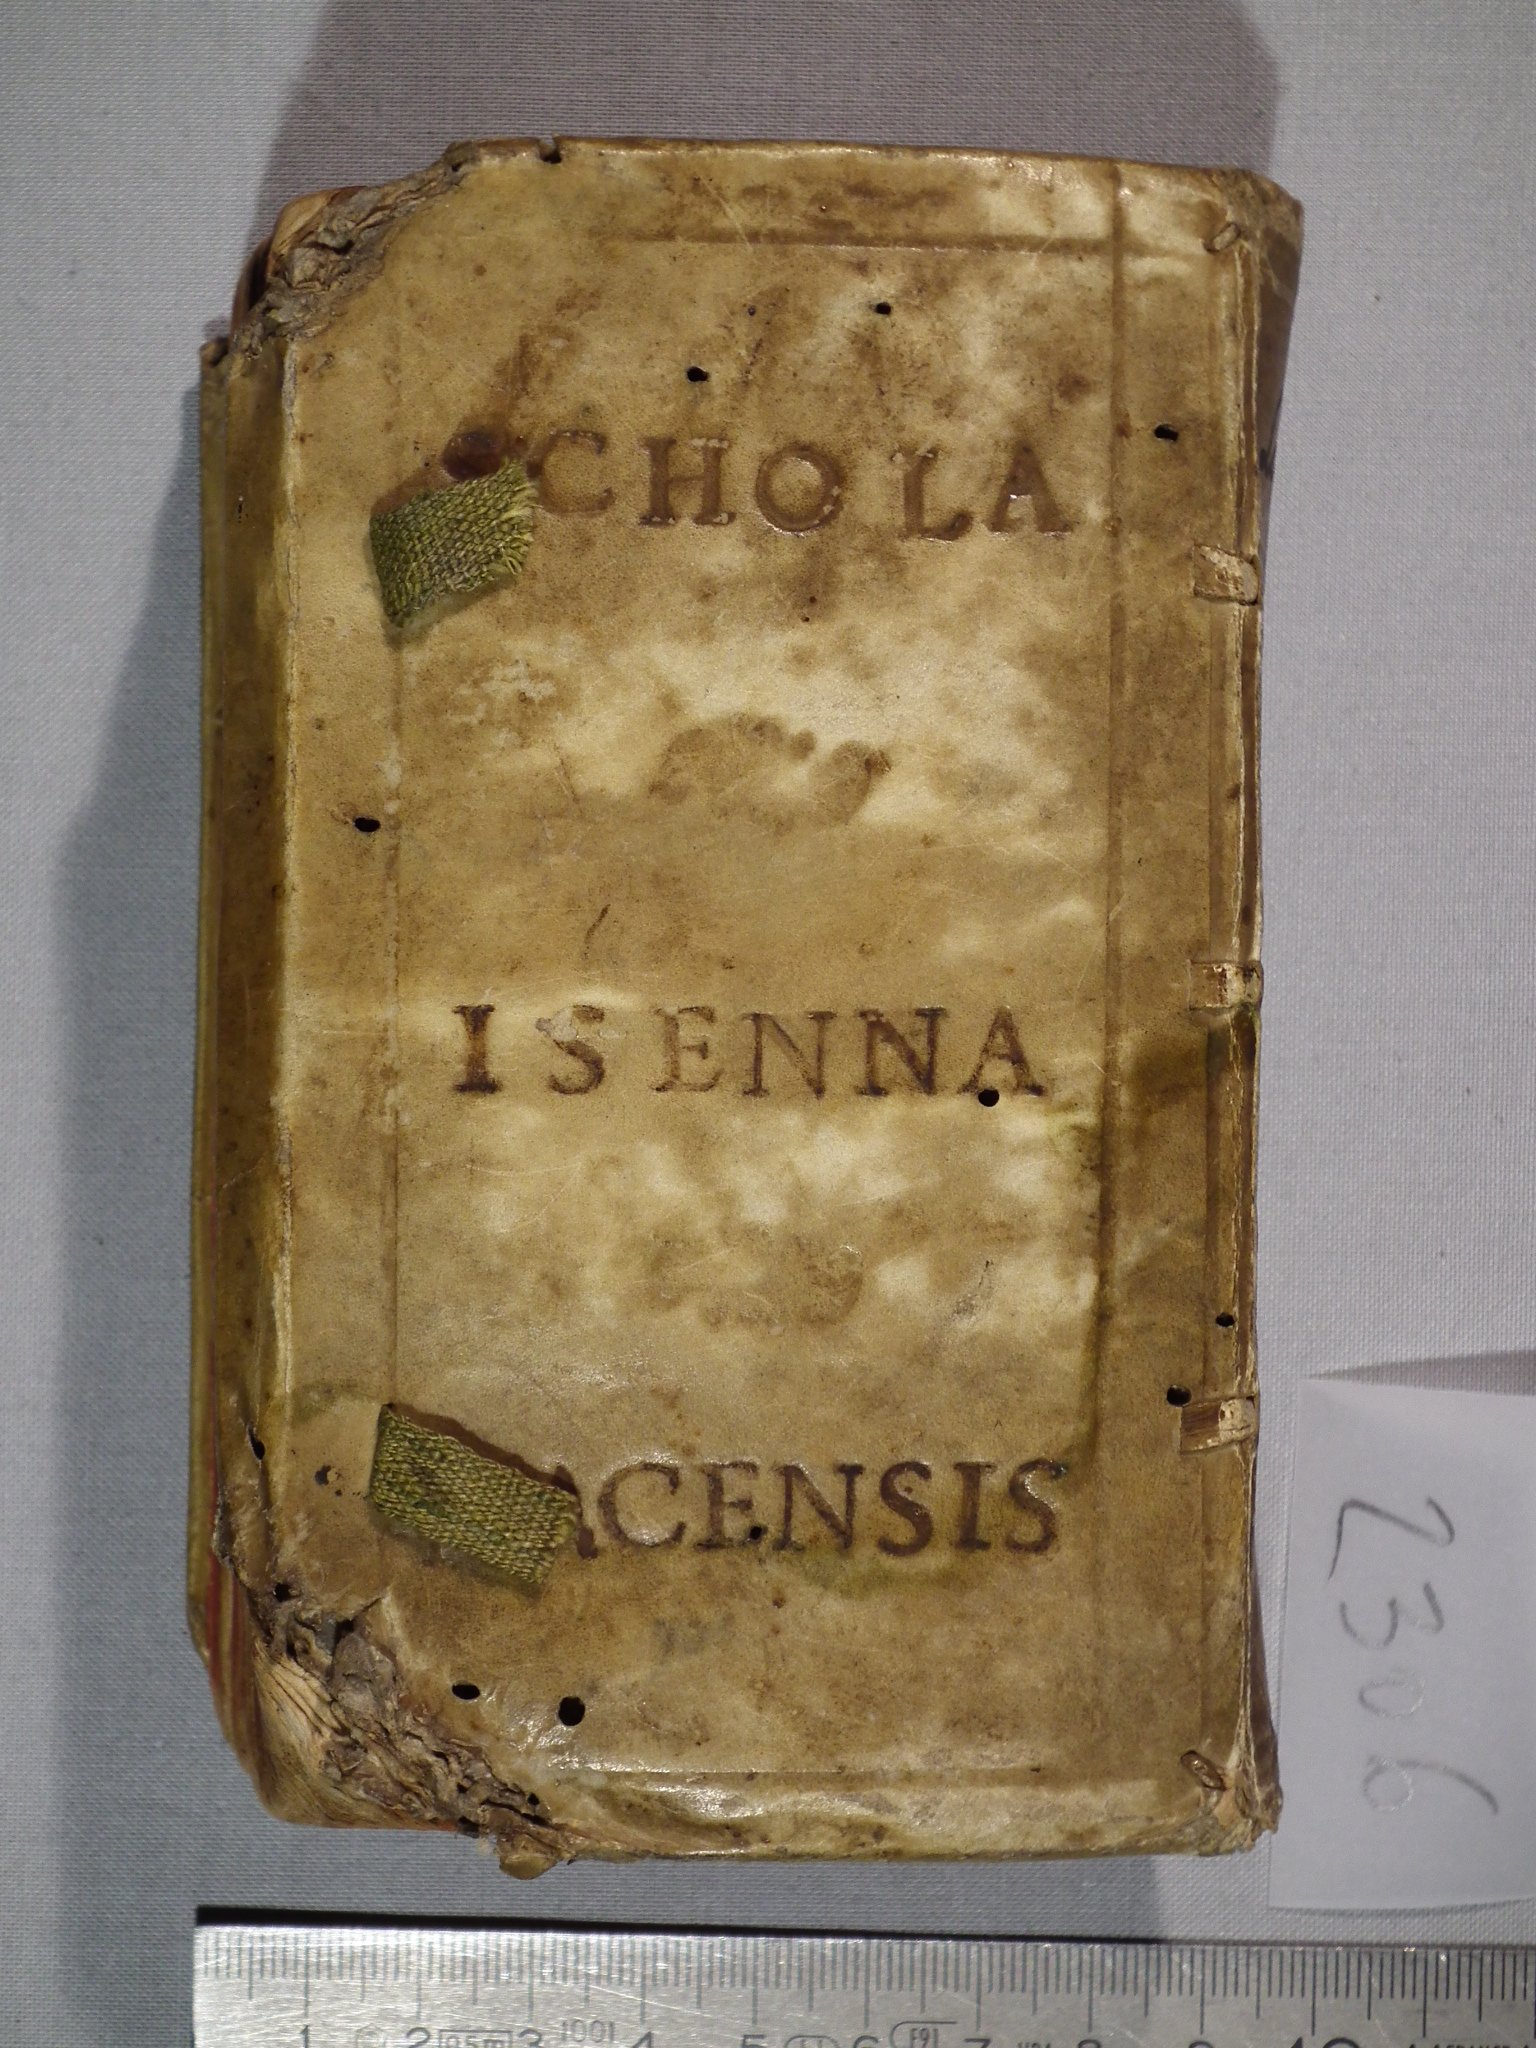 DISCANTI, Schola Isenna Nacensis, 1600. Wartburg-Stiftung Eisenach